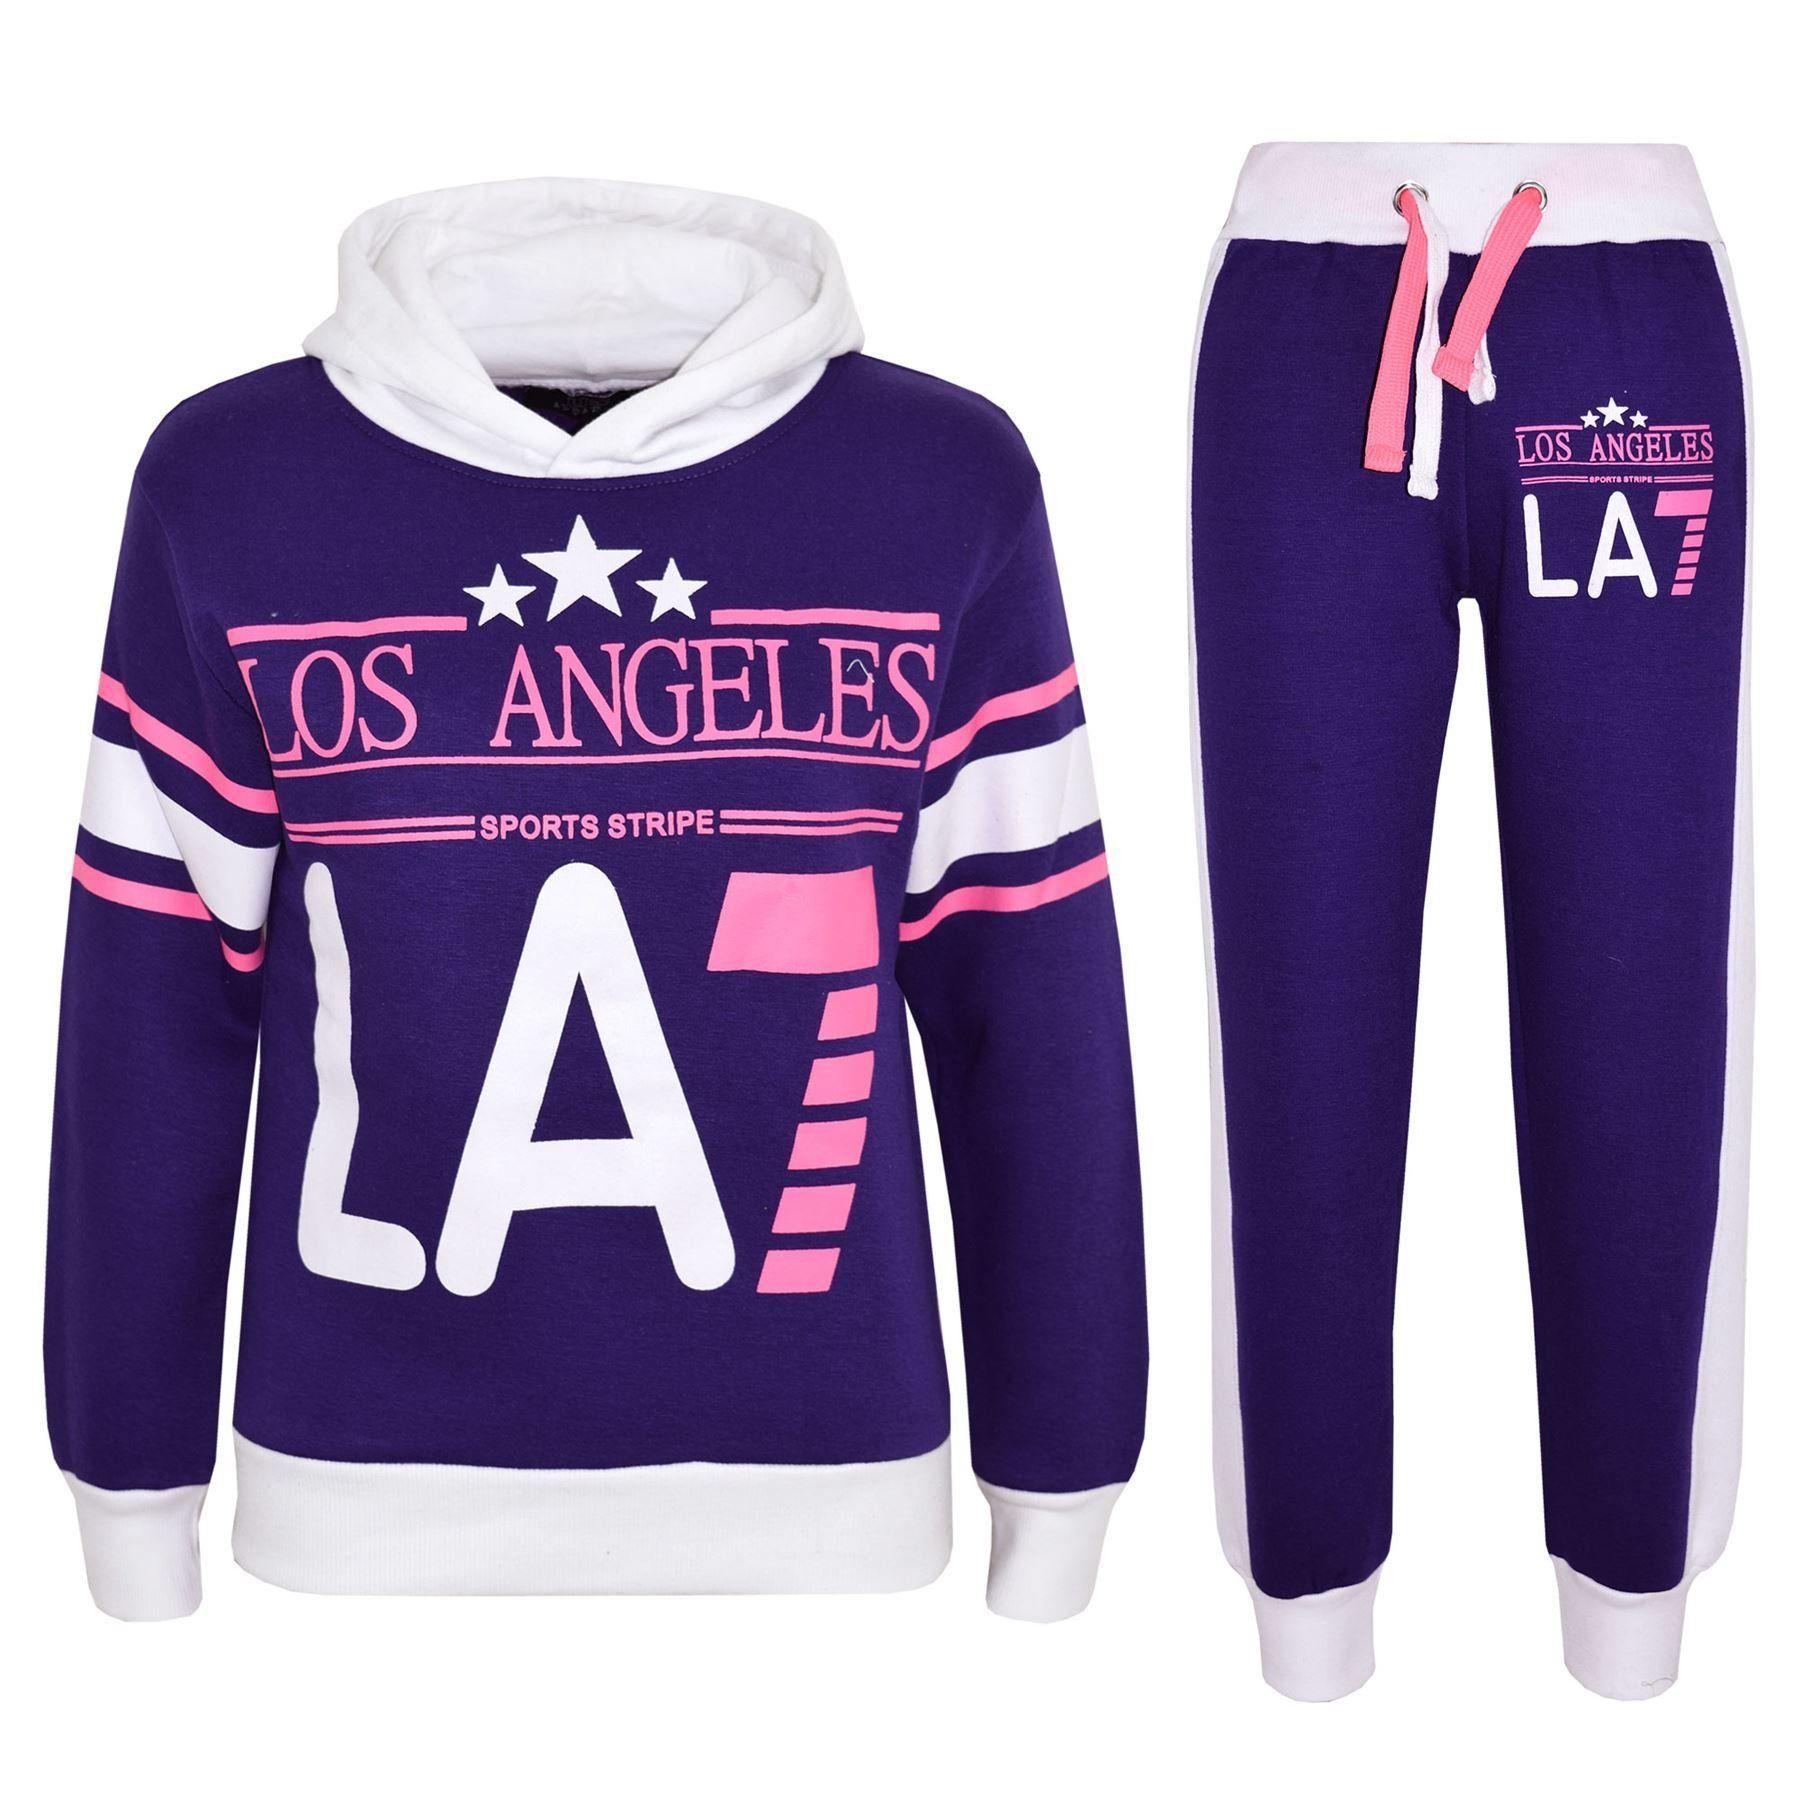 e8d286b2 Kids Girls Tracksuit LOS ANGELES LA7 Print Hoodie & Bottom Jog Suit ...